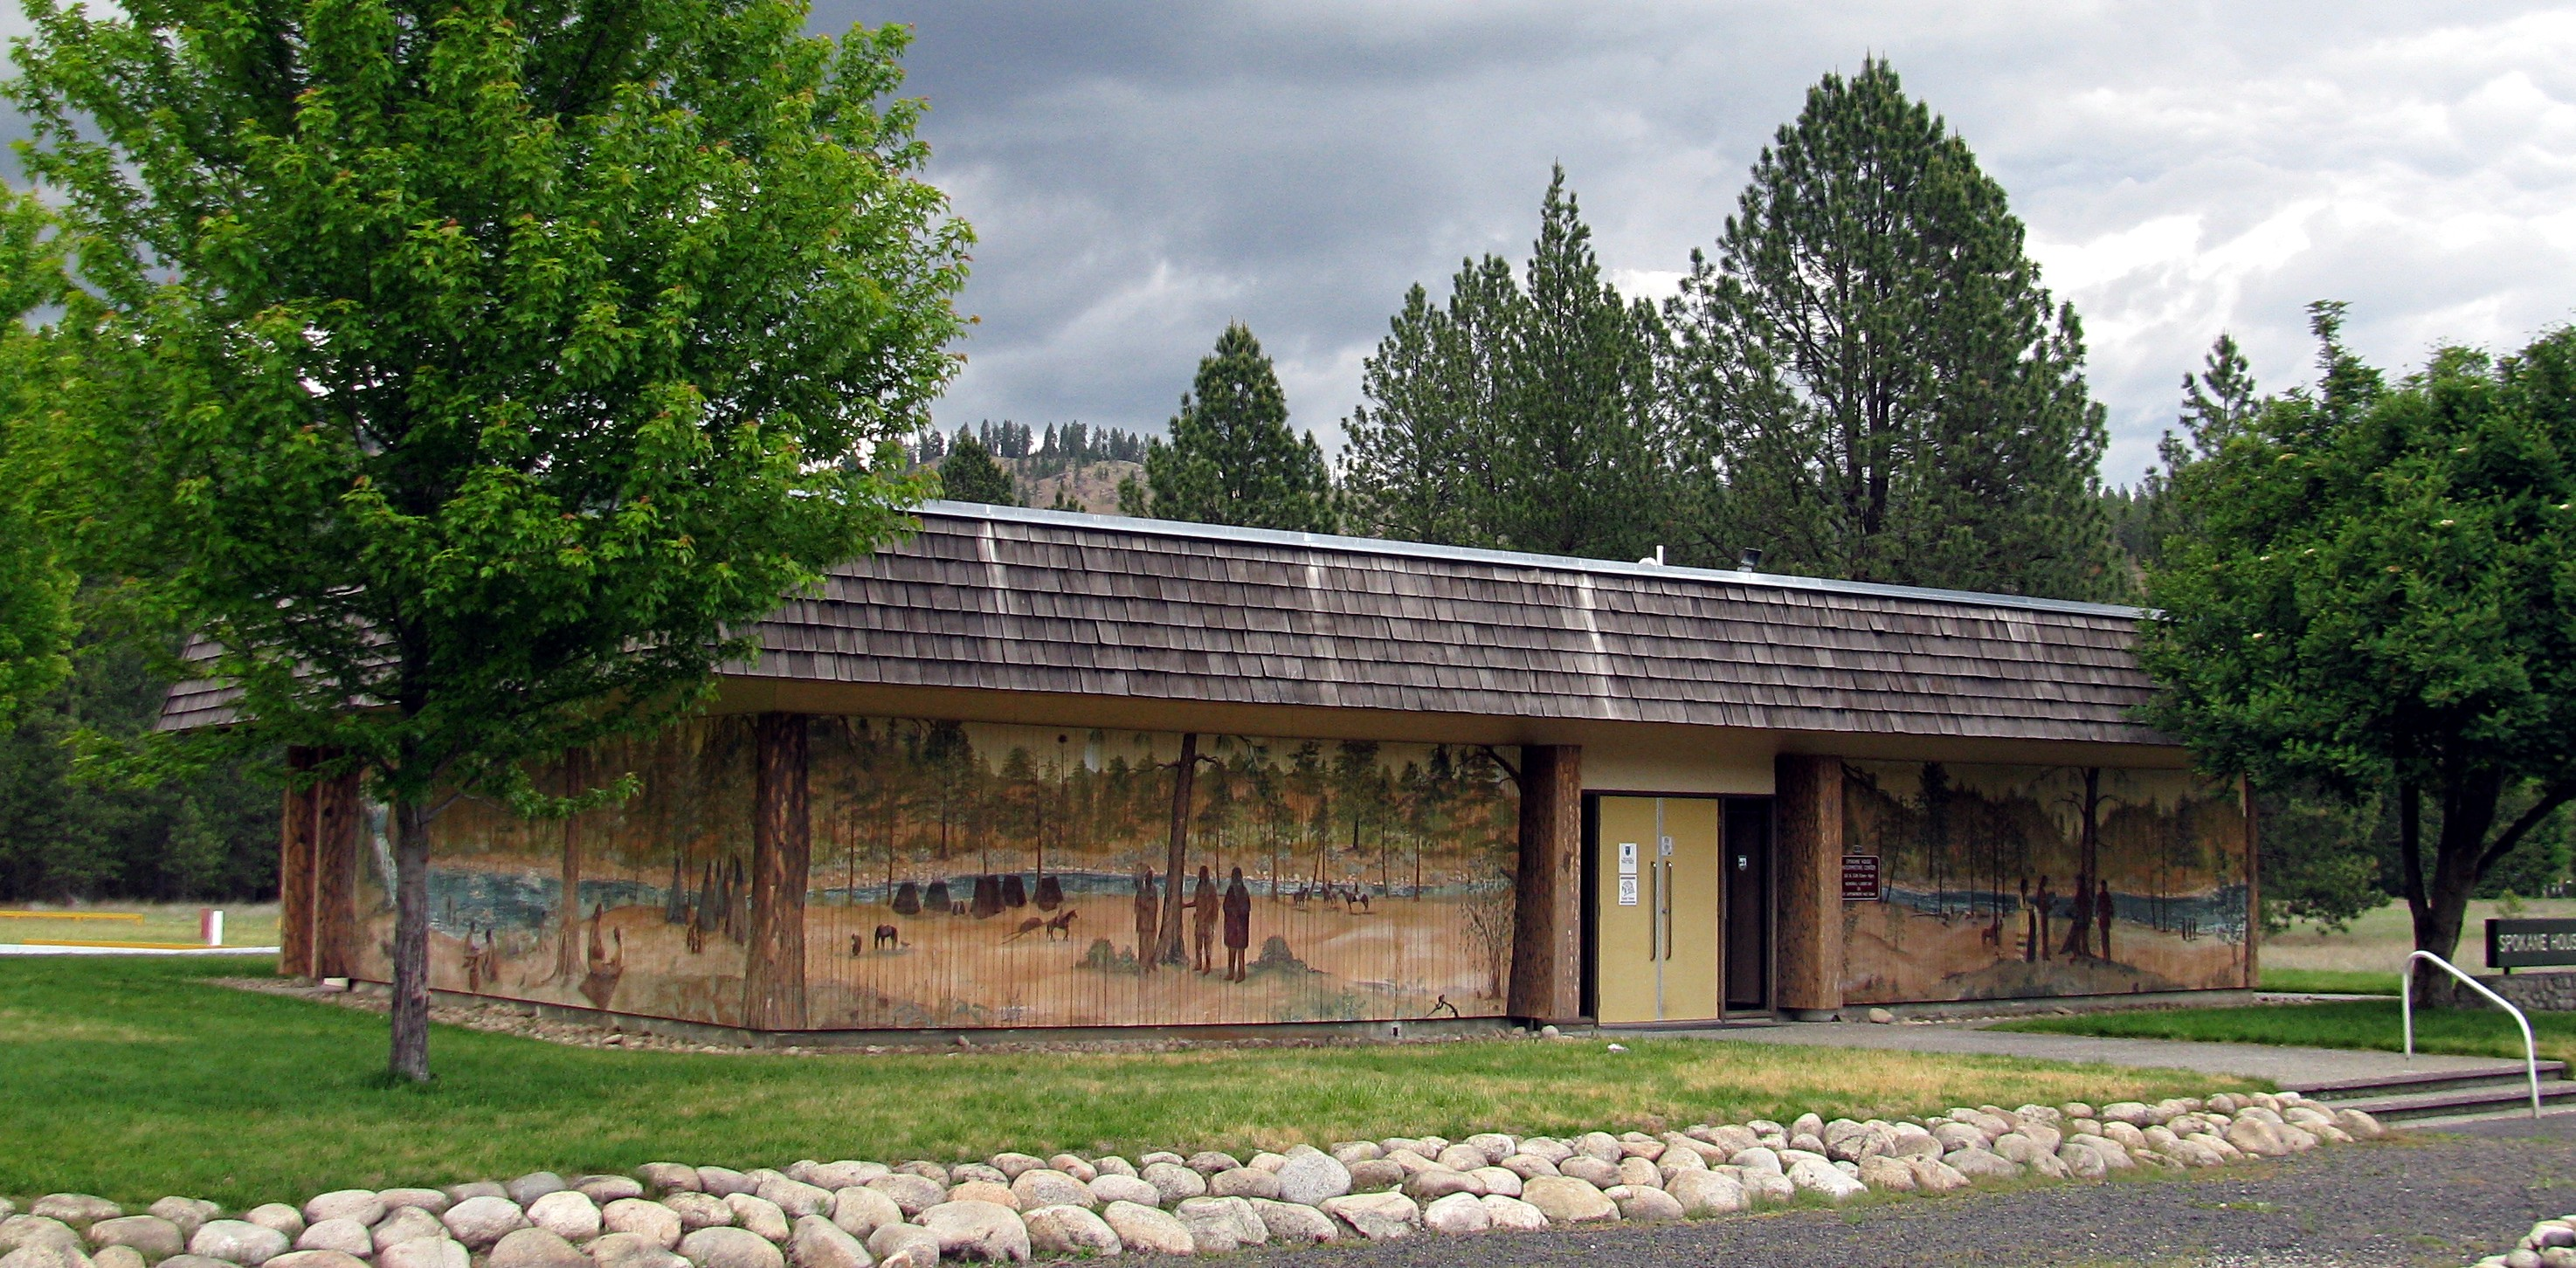 file spokane house interpretive center riverside state park rh commons wikimedia org